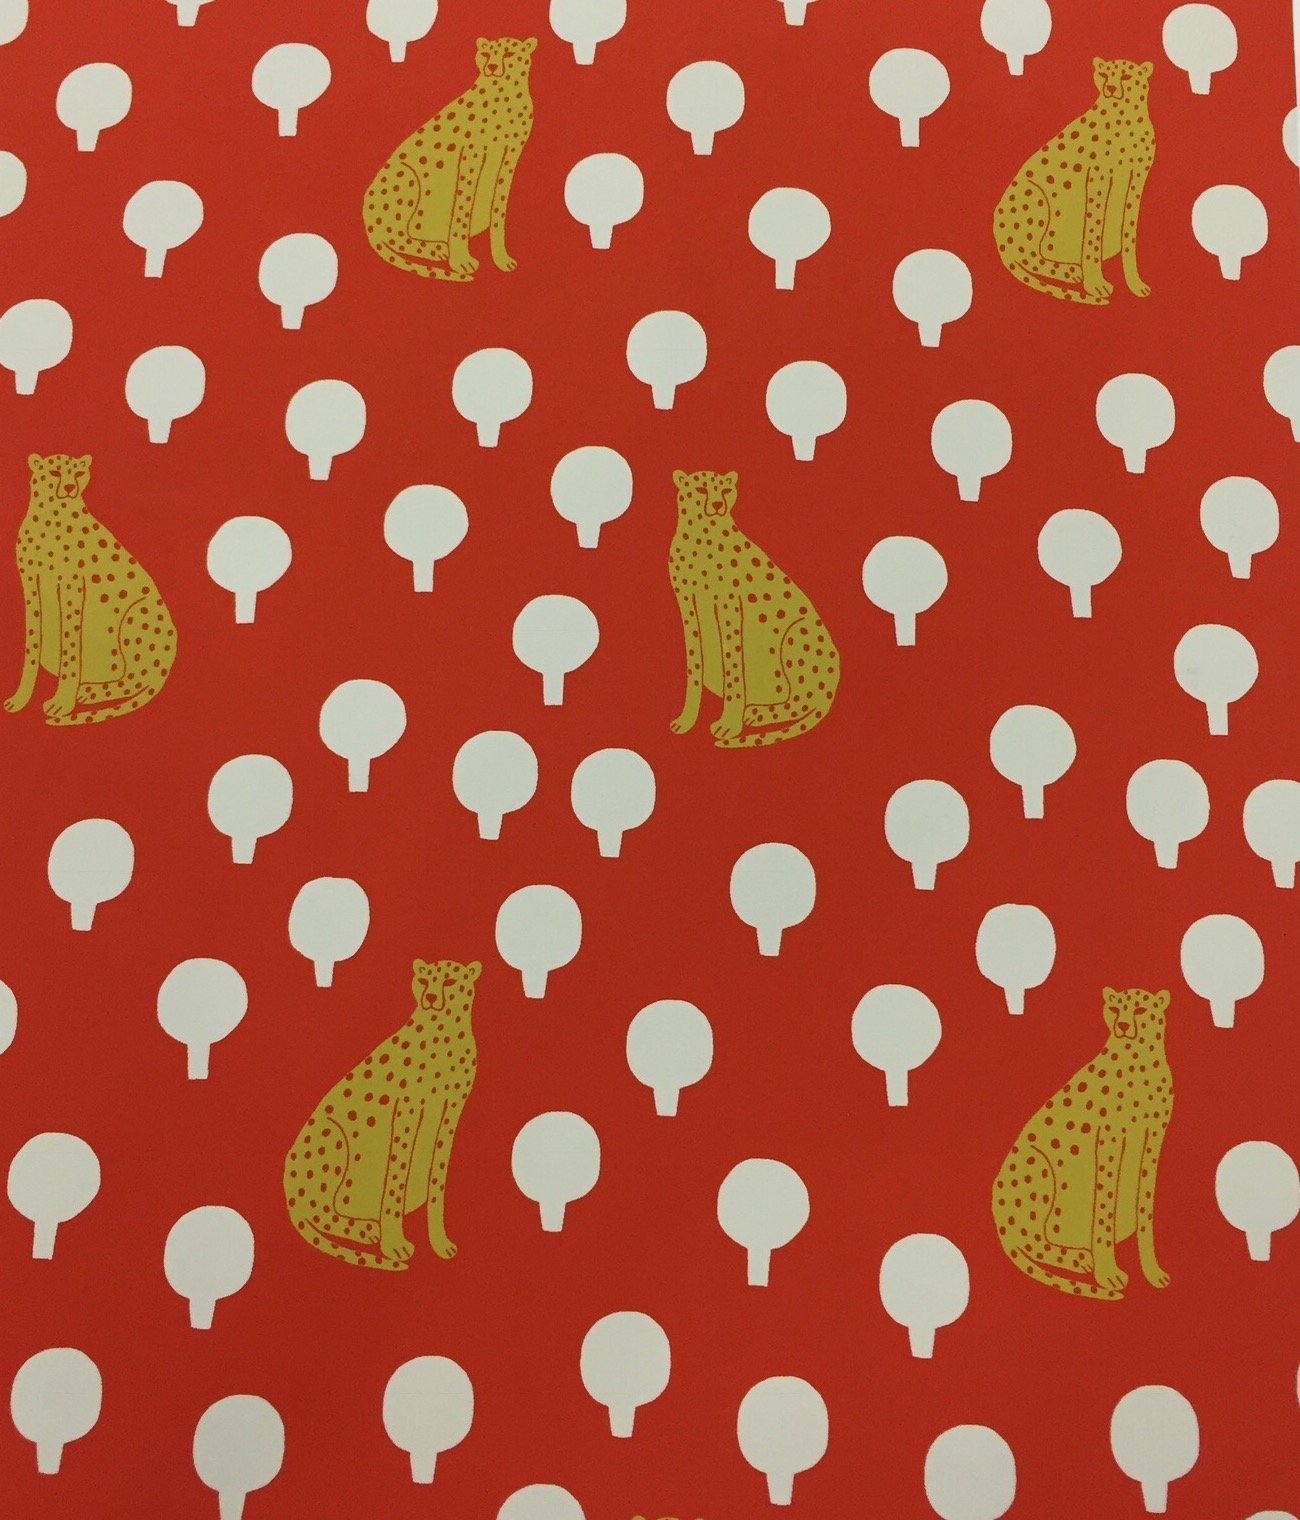 COMING SOON MARCH 2018! Cheetahs Sarah Golden Retro Cotton Quilt Fabric